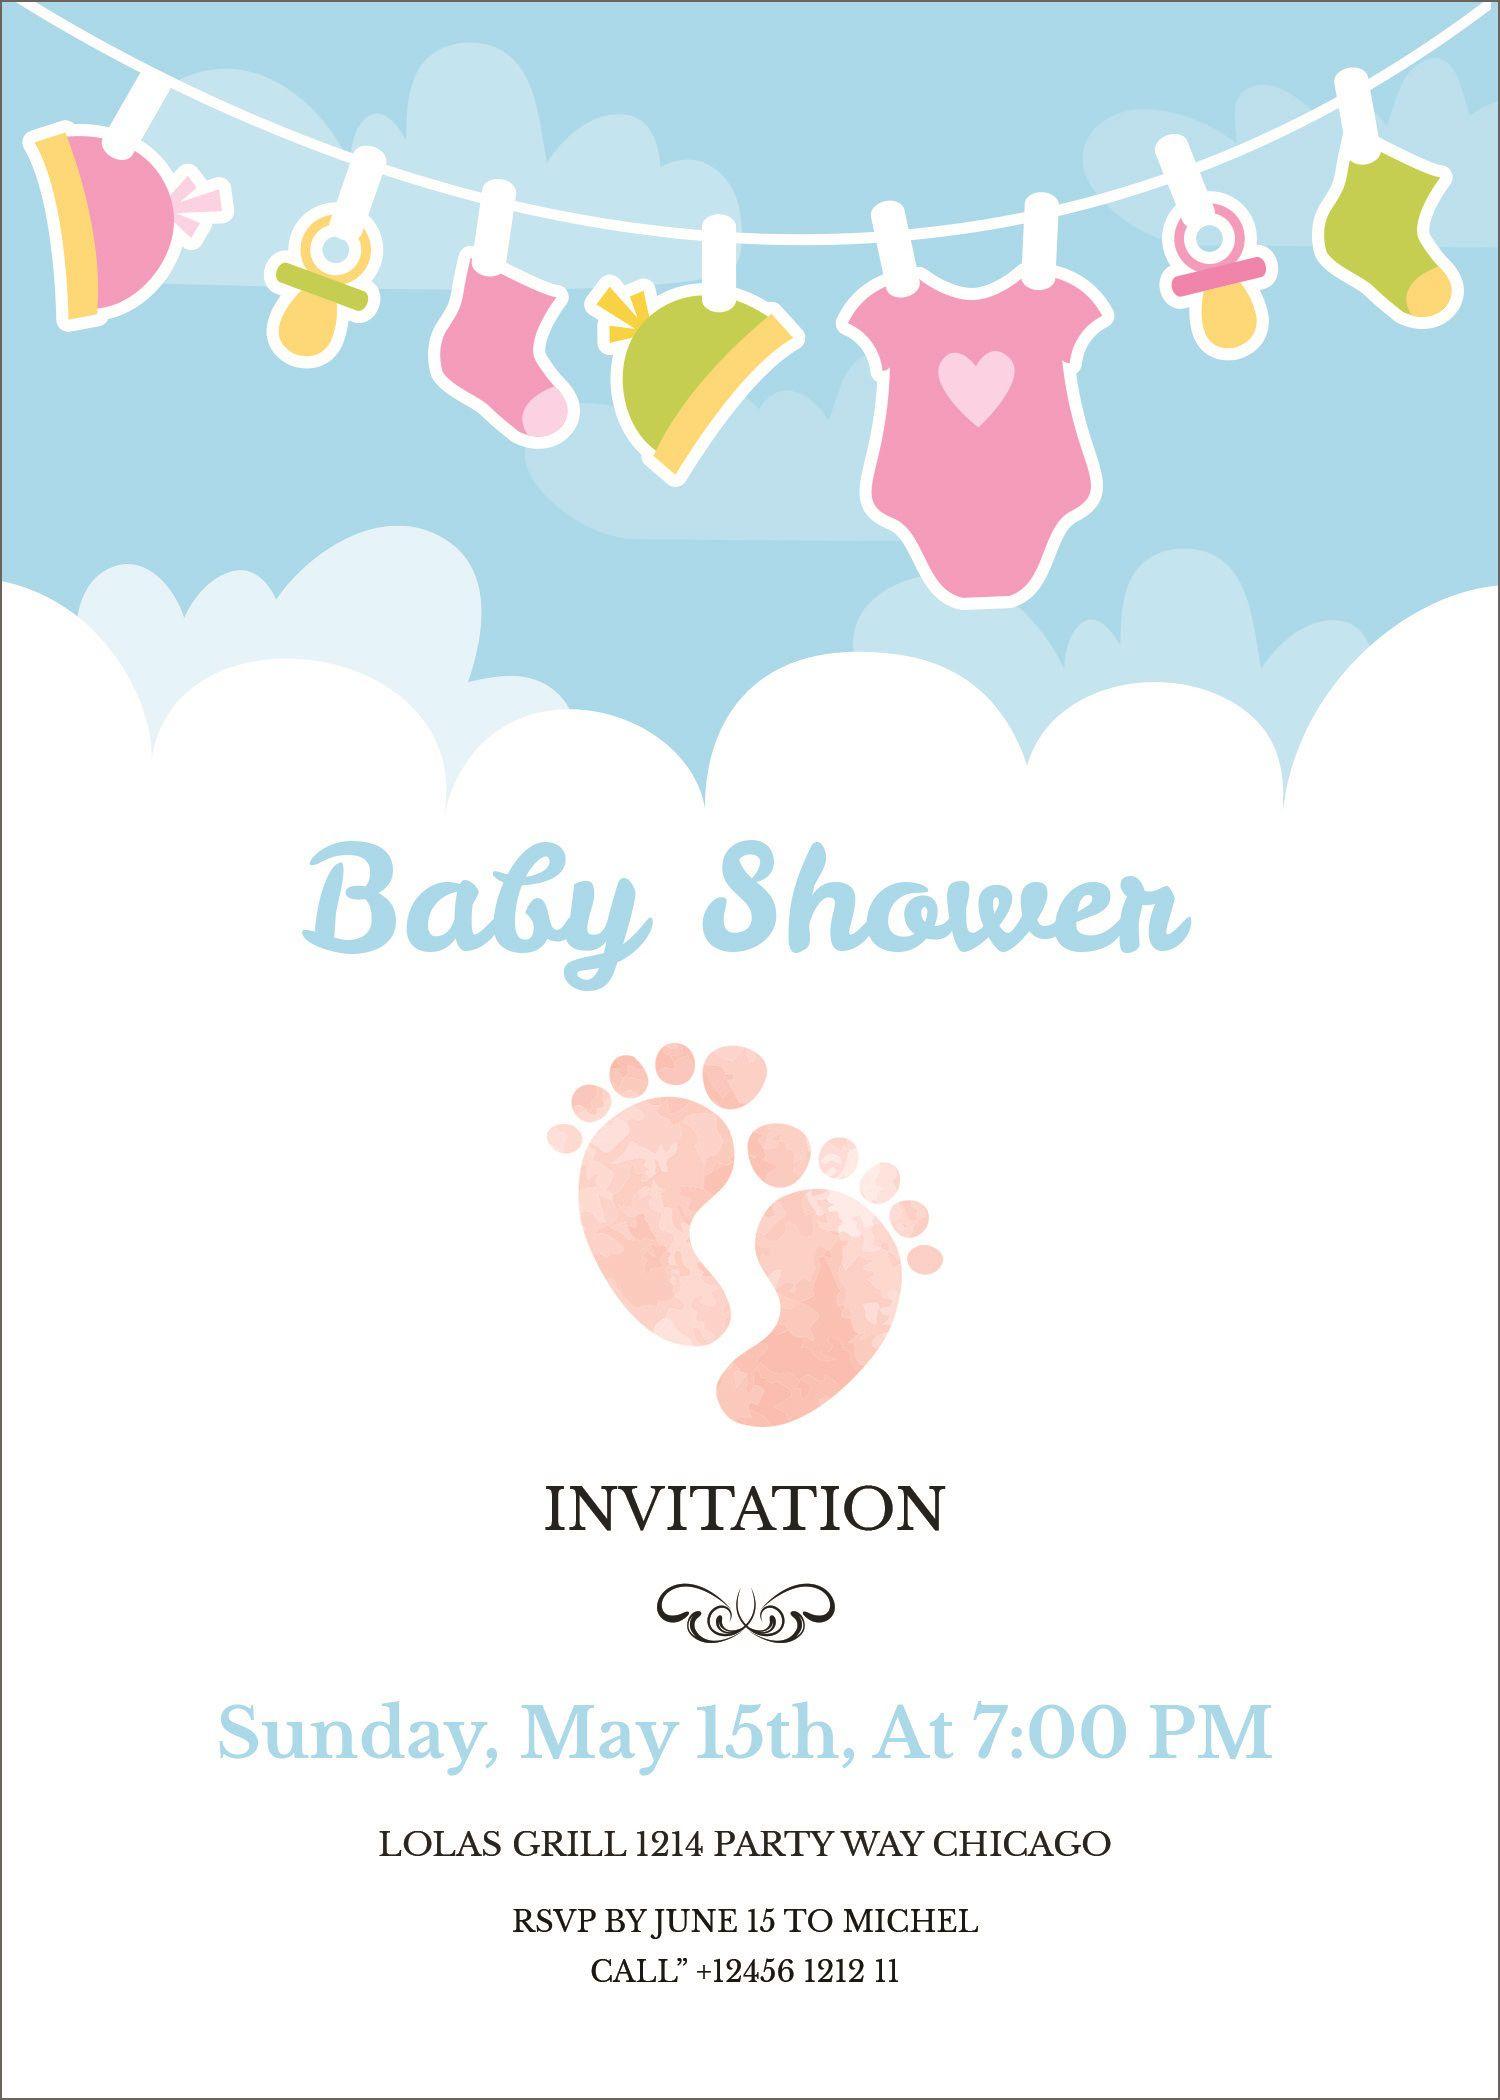 005 Rare Free Baby Shower Invitation Template Editable Highest Quality  Digital Microsoft WordFull